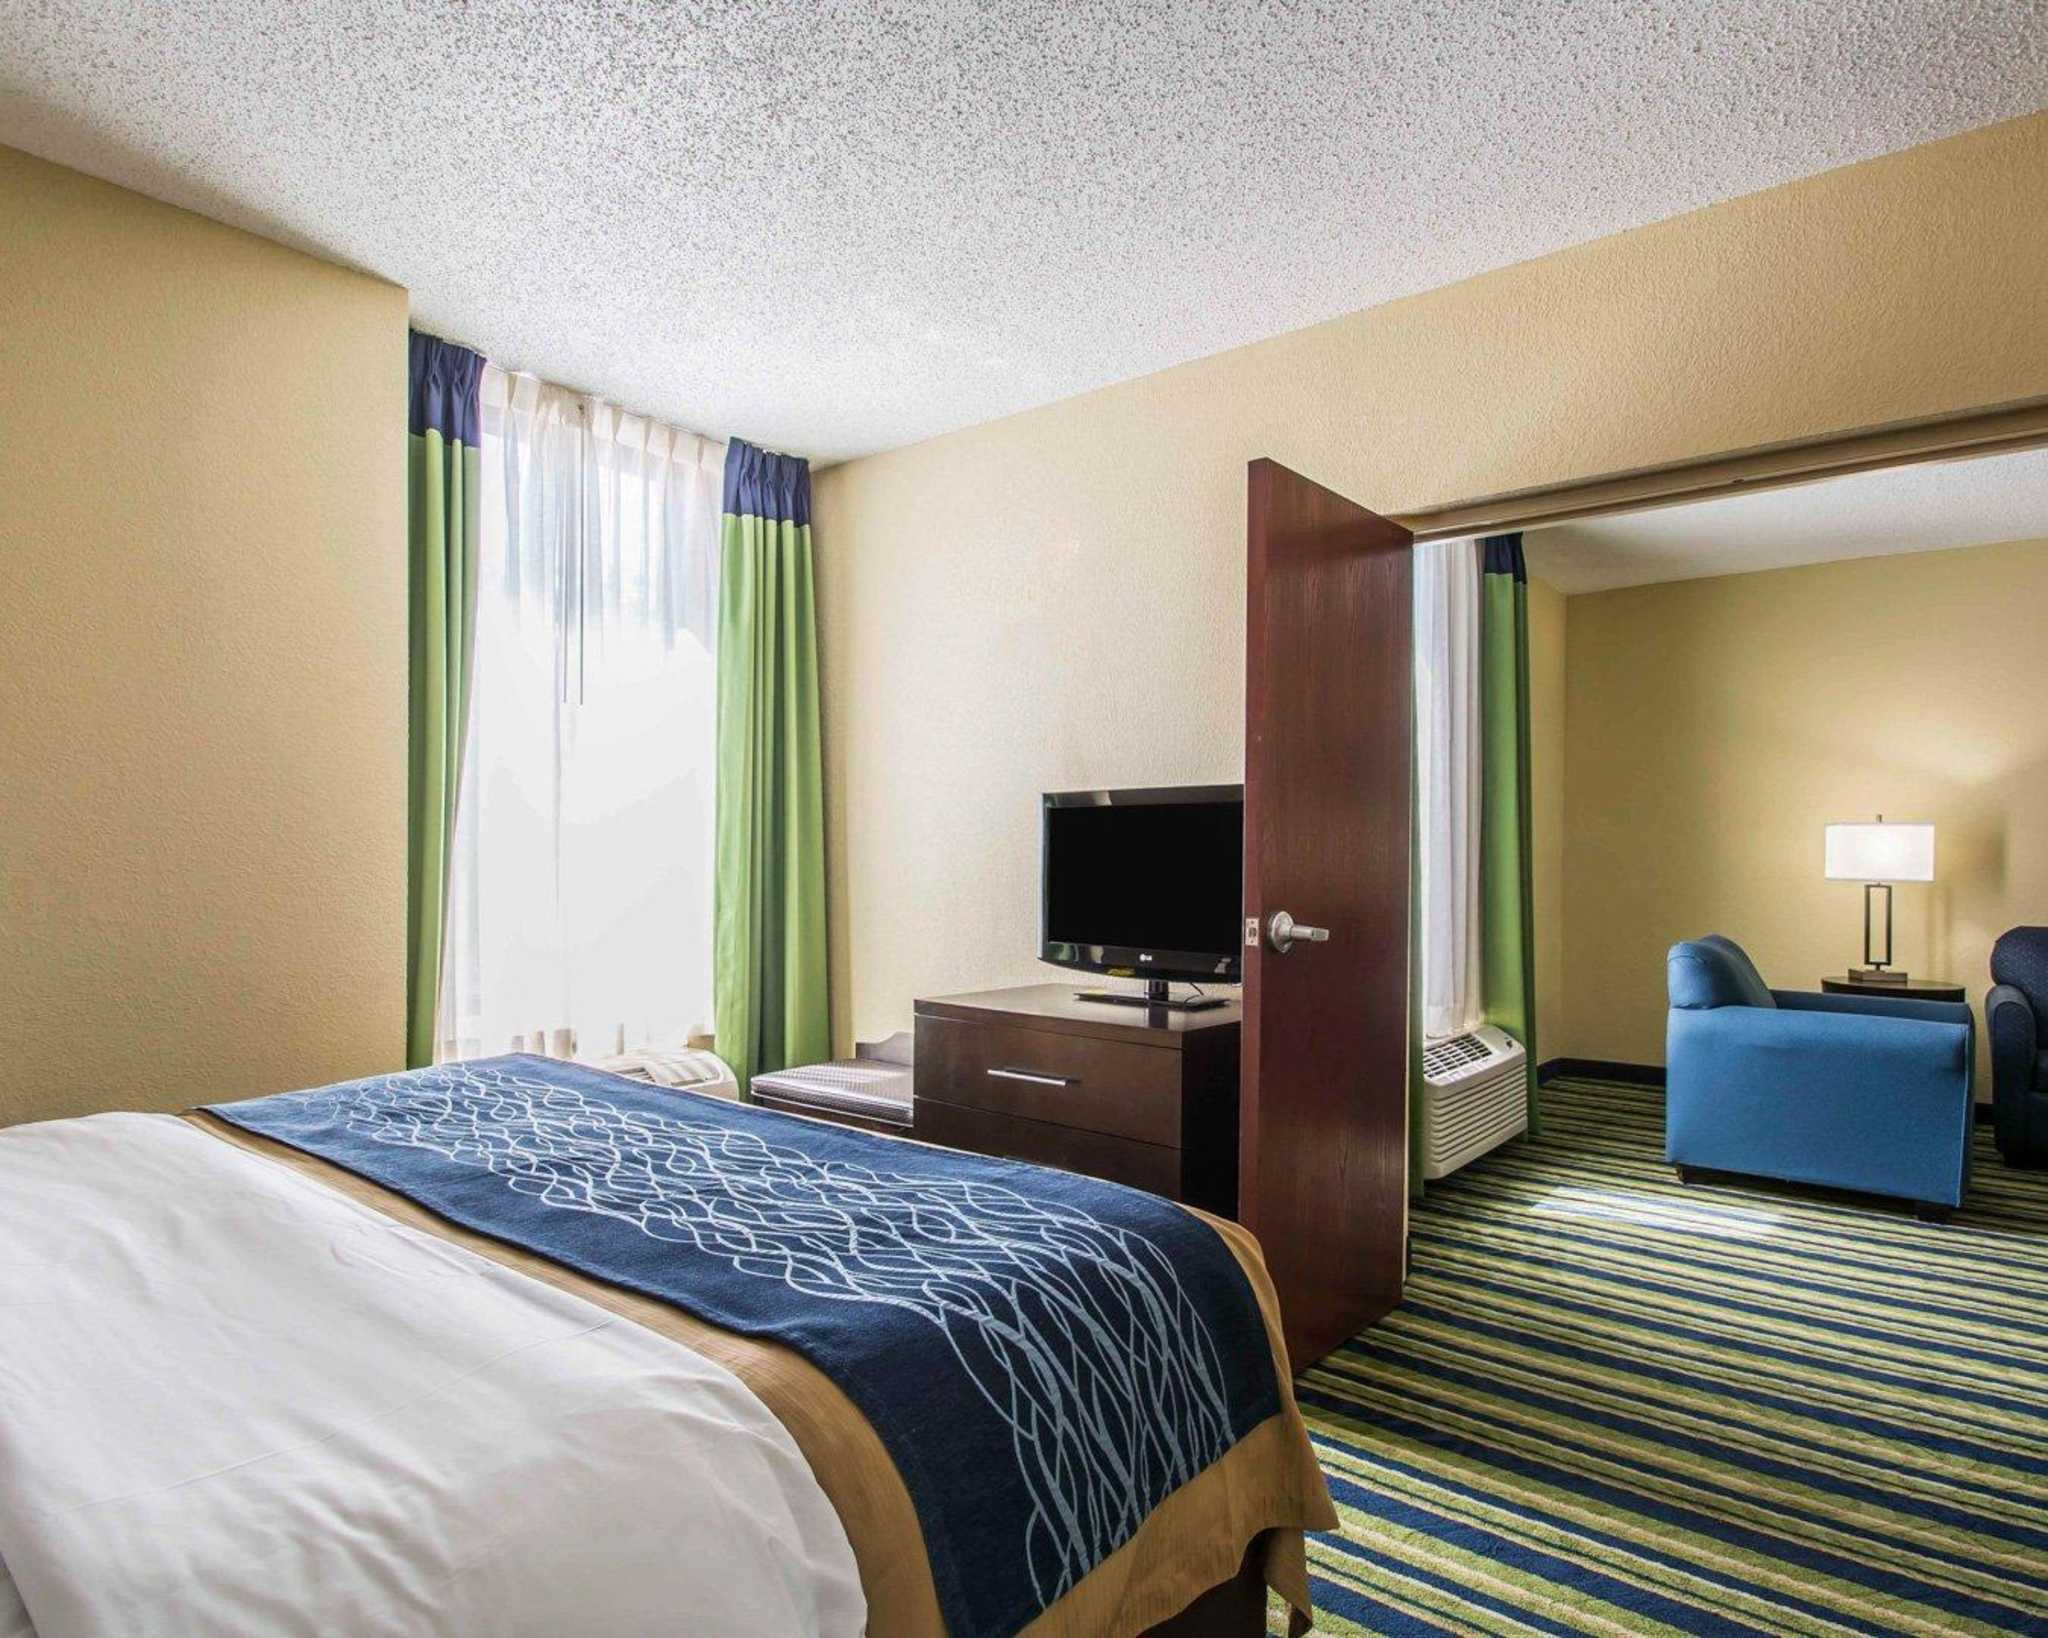 Comfort Inn & Suites Lantana - West Palm Beach South image 23